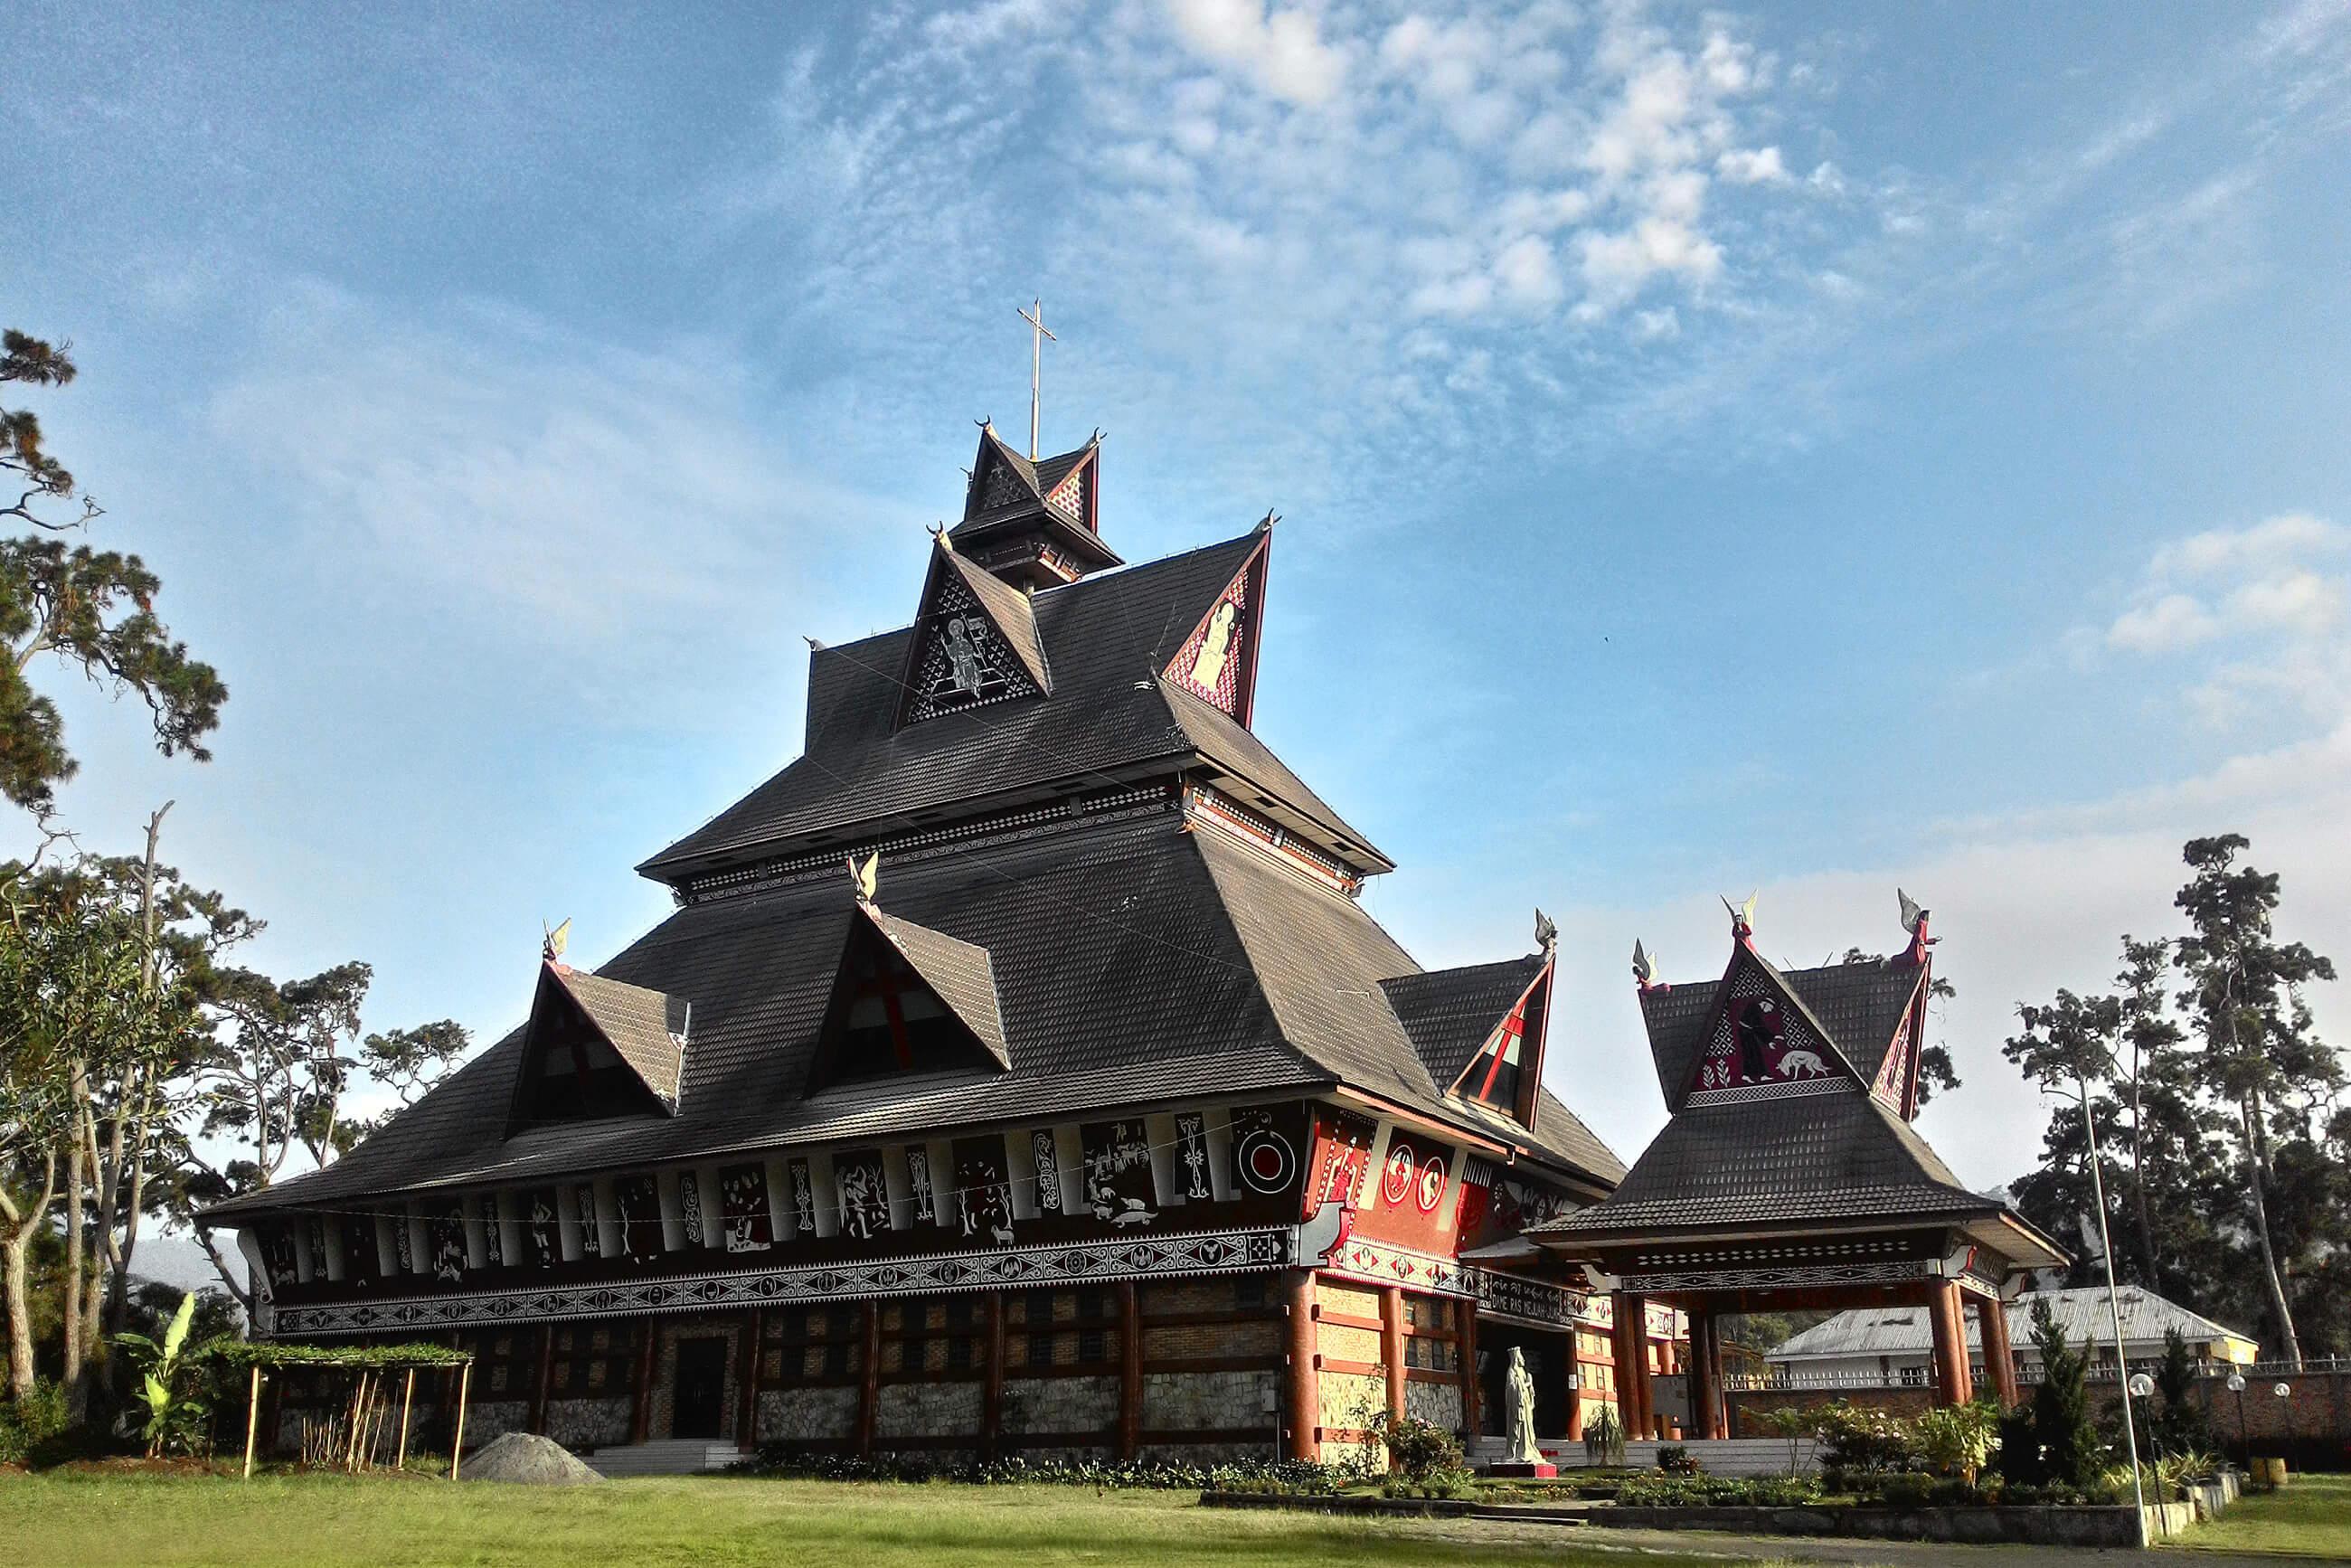 https://bubo.sk/uploads/galleries/7396/freeimage_sumatra_kostol.jpg